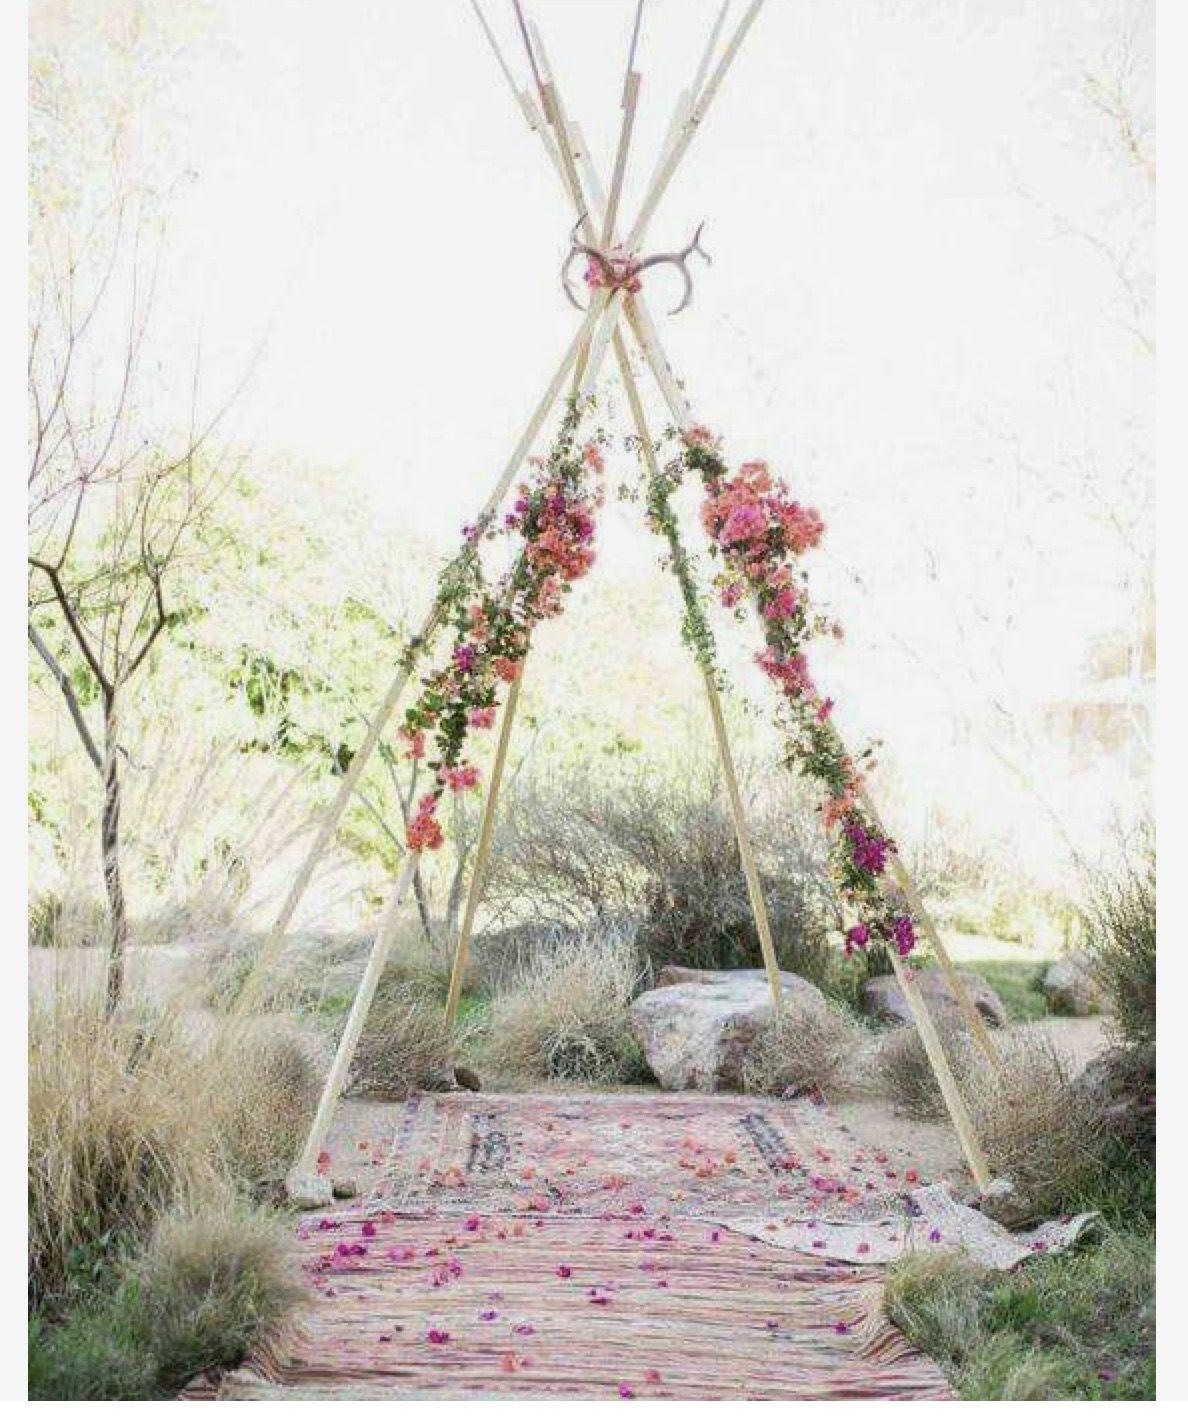 Altarpiece Wedding: Pin By JamieKiesha Mills On Party/Reception Ideas